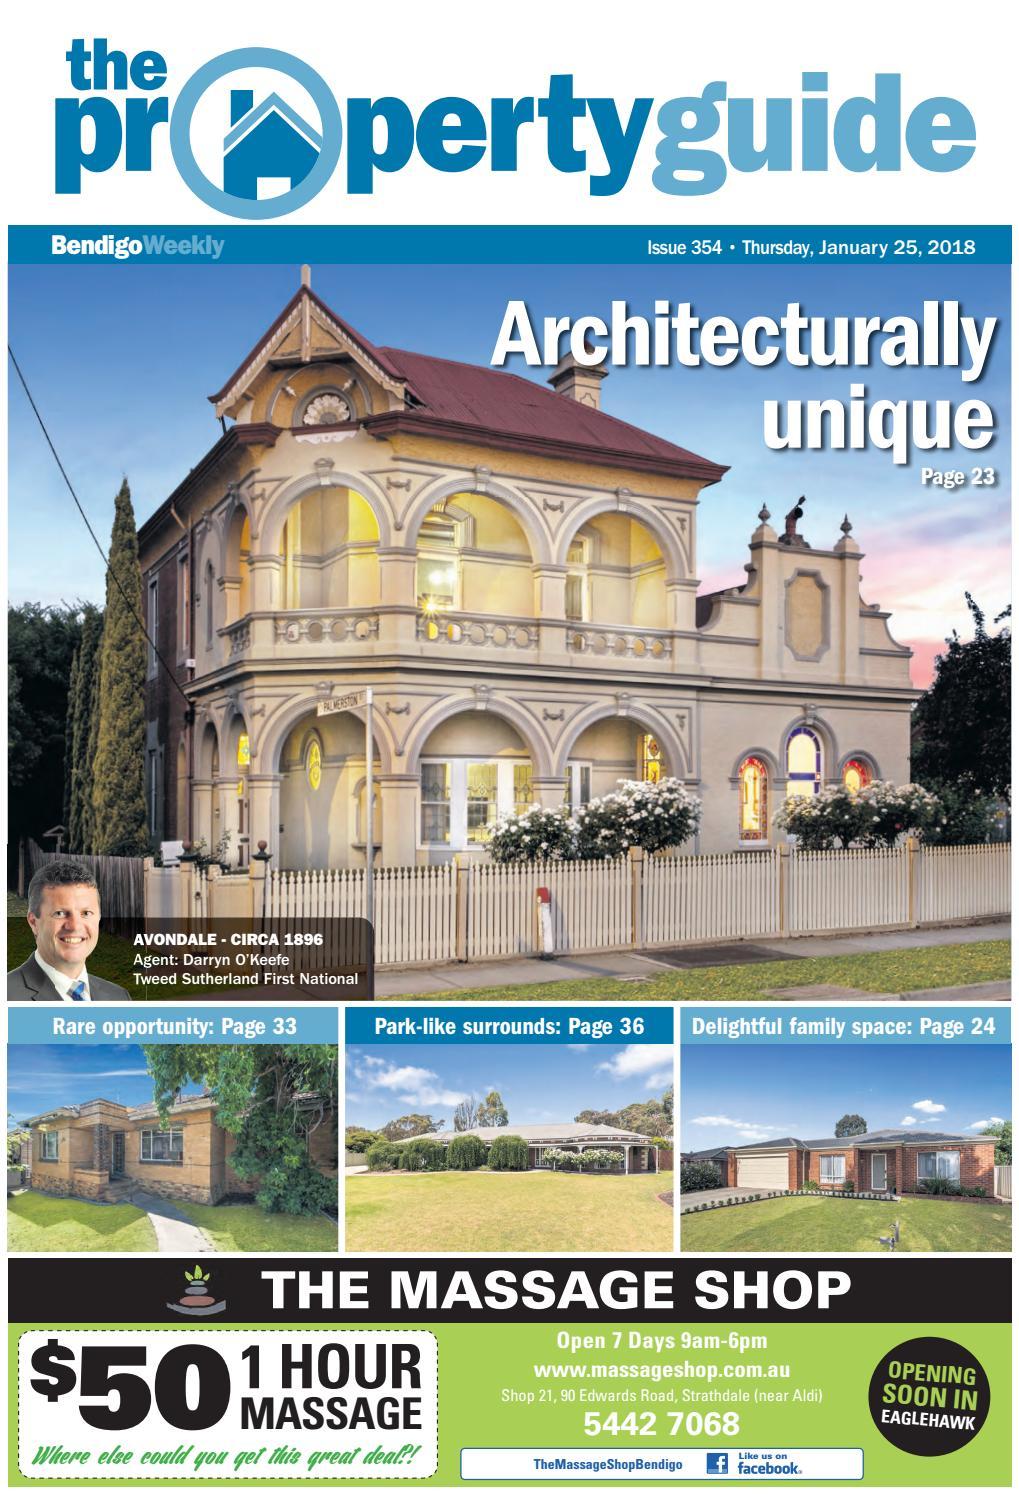 Bendigo Weekly Property Guide 354 by Bendigo Weekly - issuu